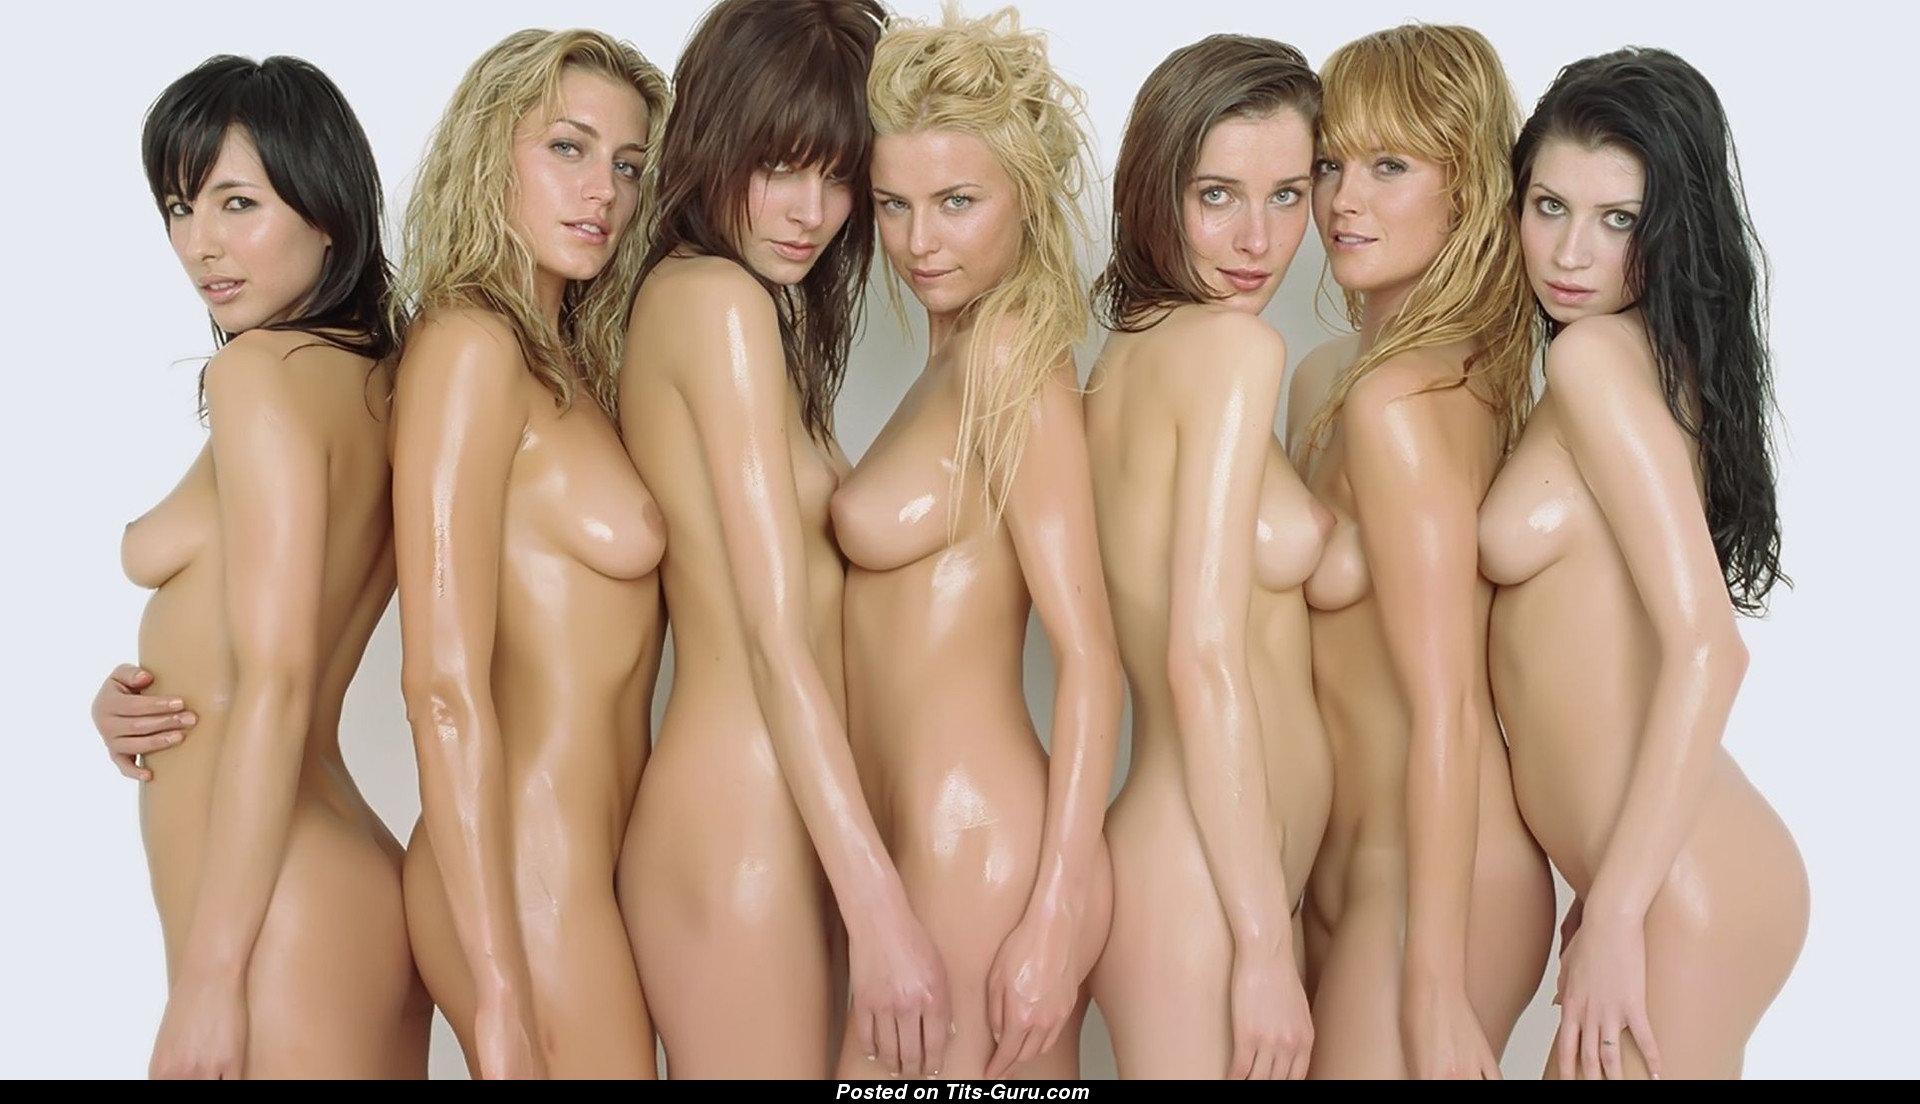 Galic girls nude — 13